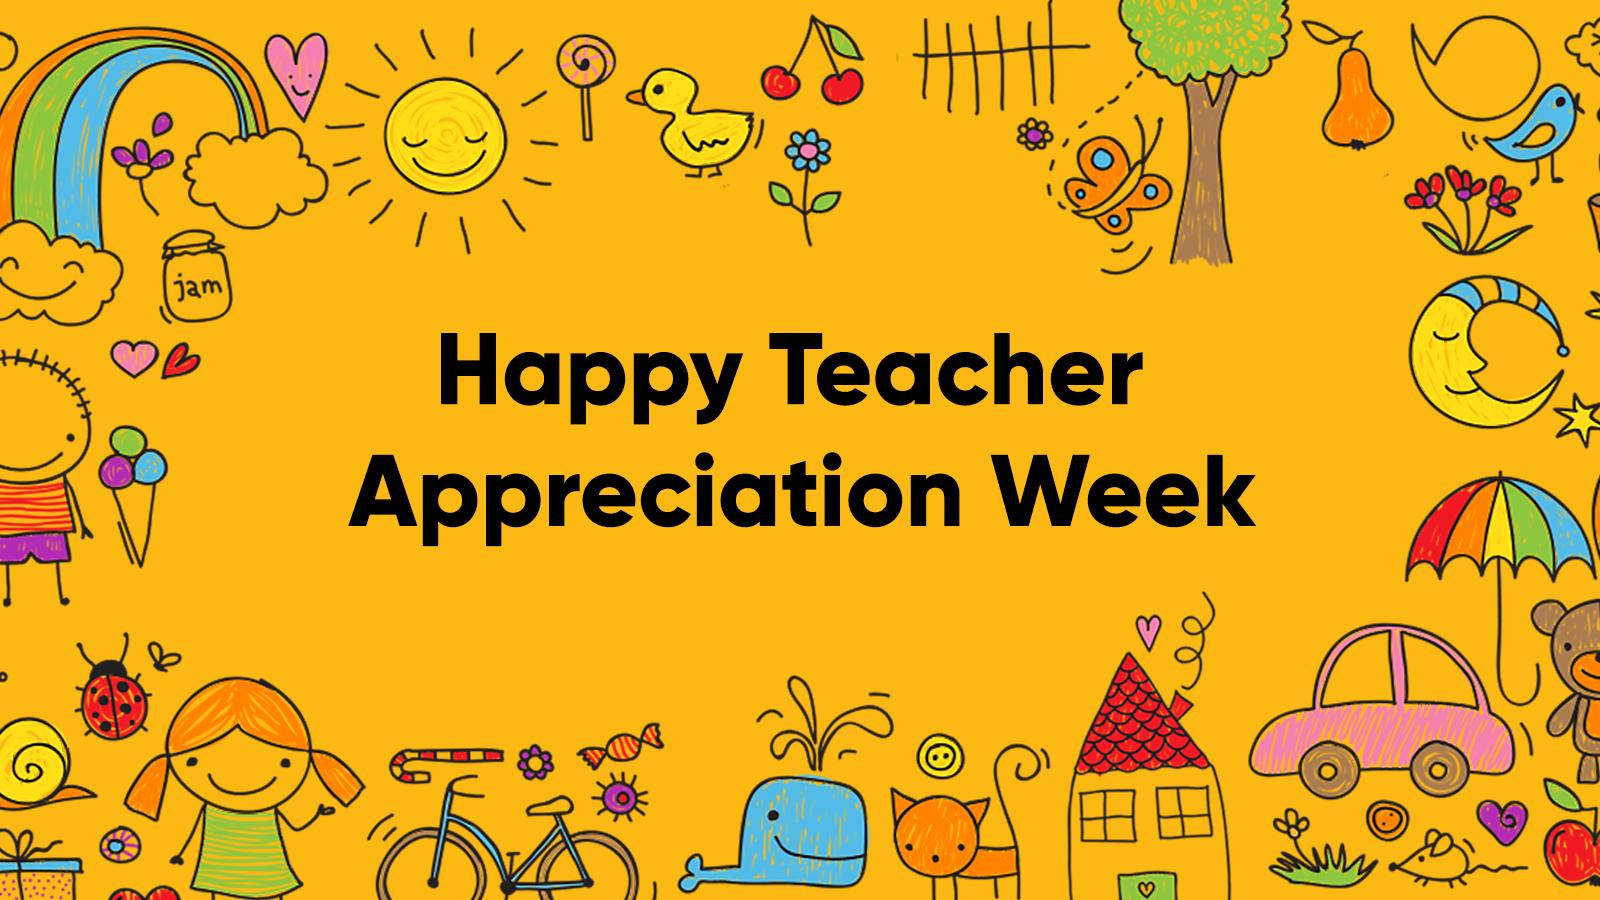 Virtual Teacher Appreciation Week 2021: How to Celebrate Remotely